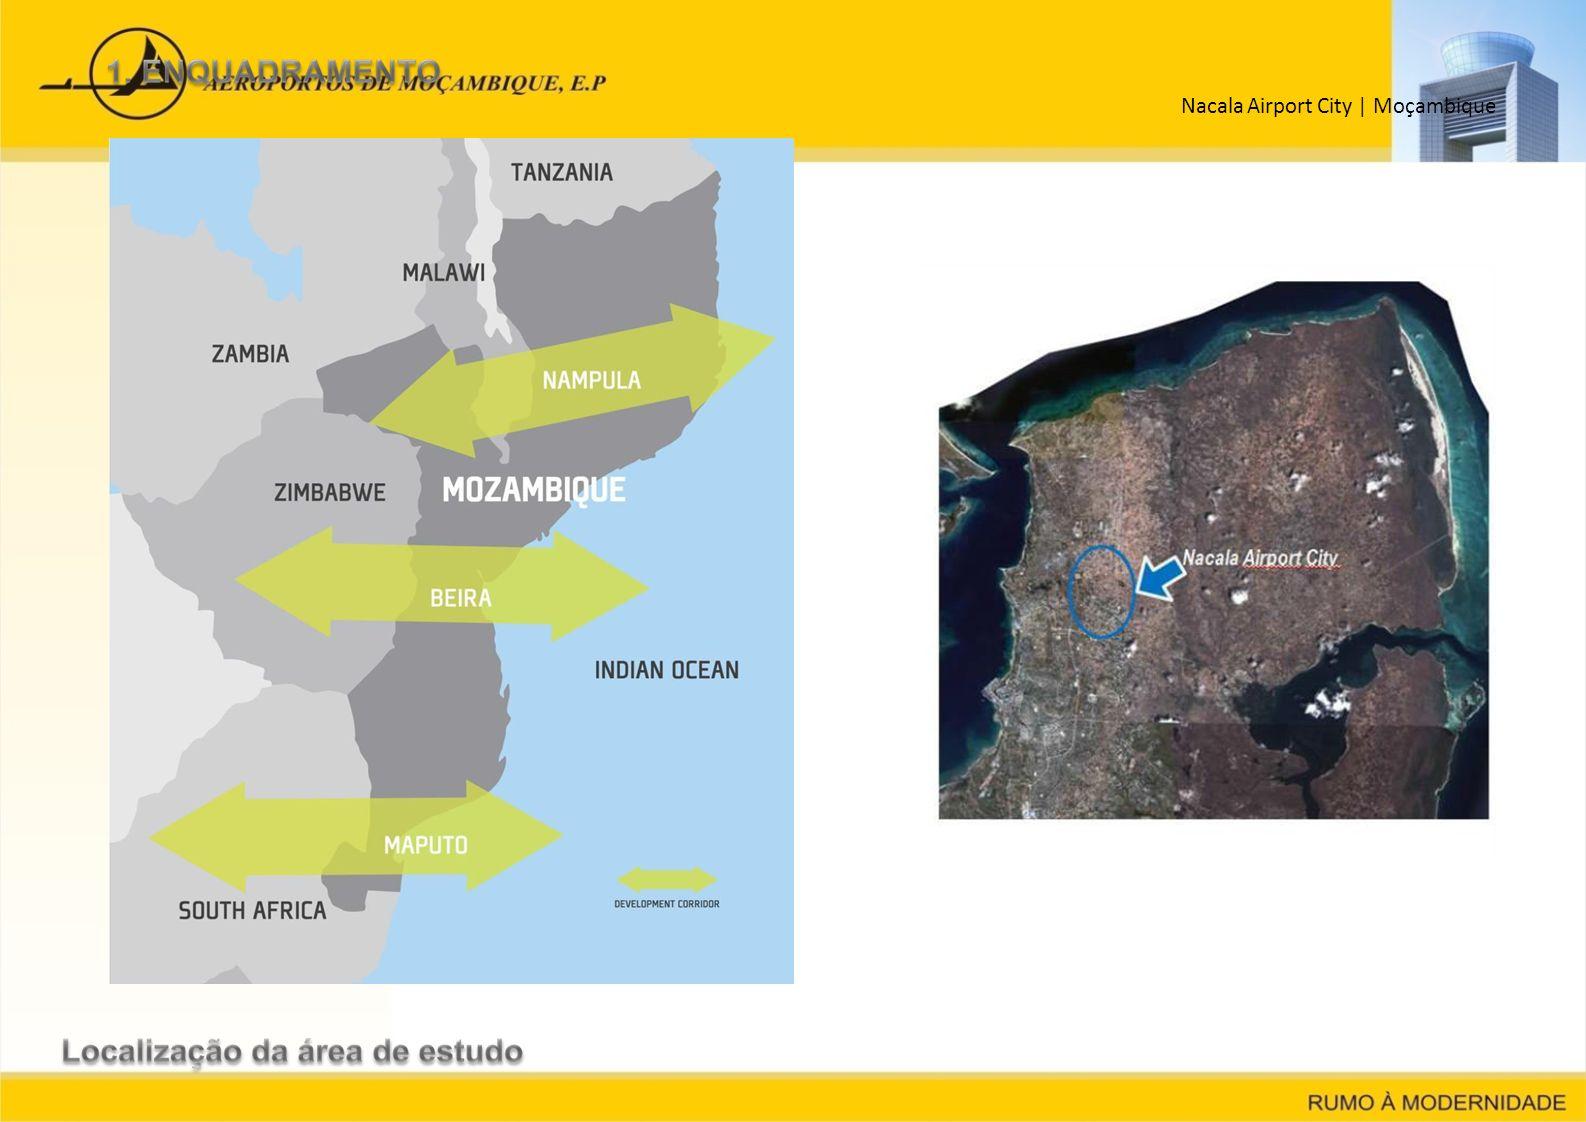 Nacala Airport City | Moçambique